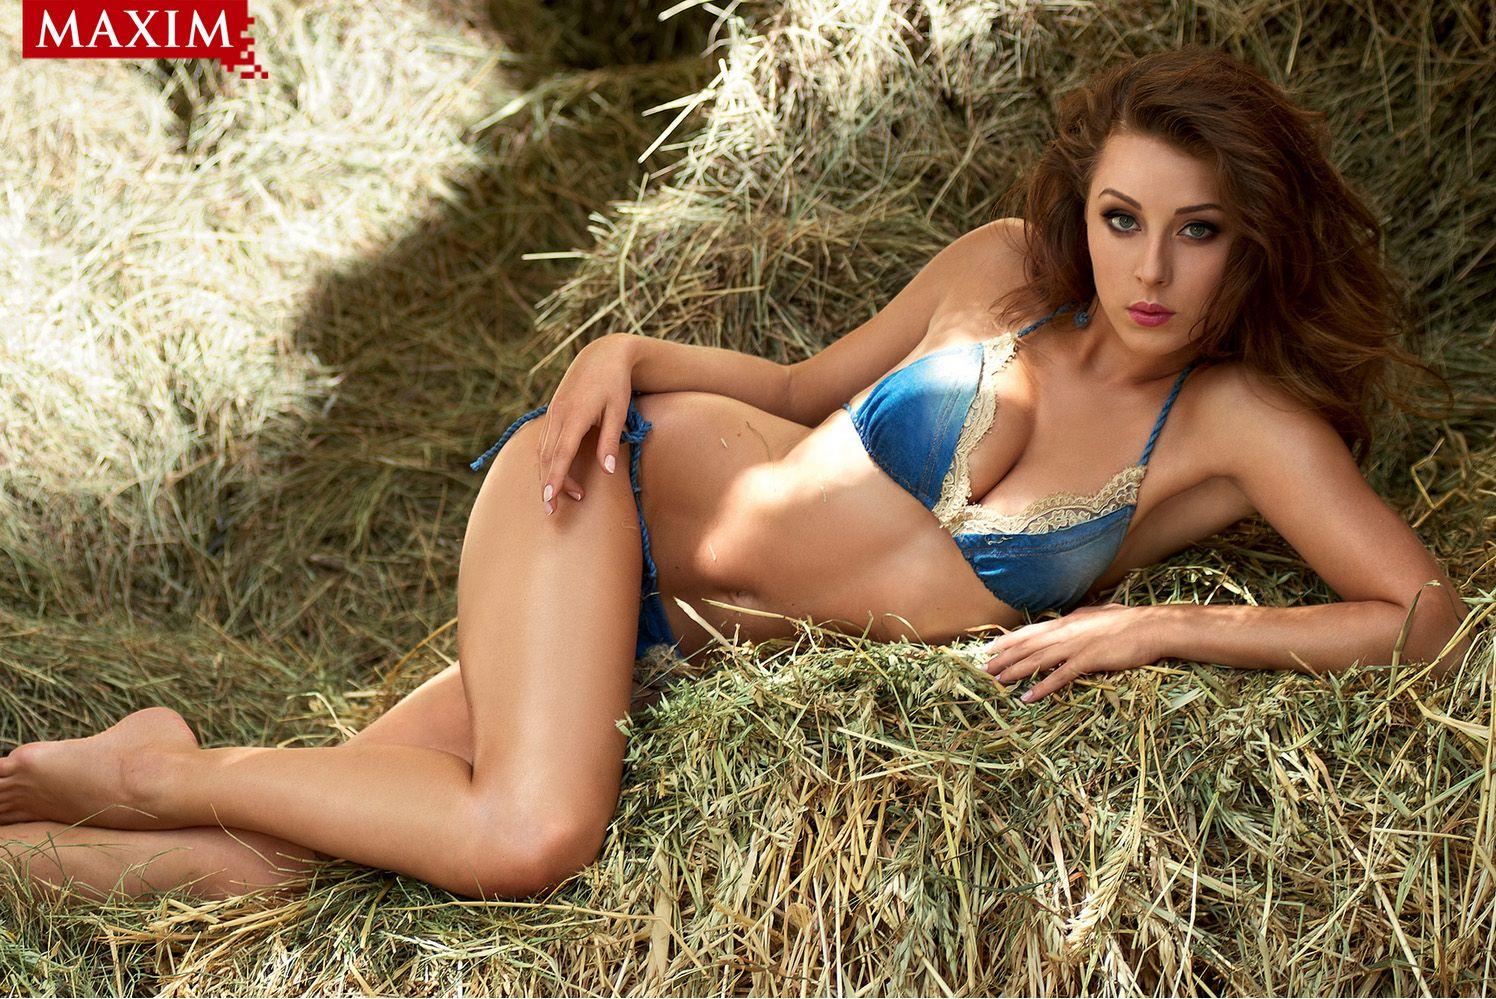 Cute amateur girlfriend naked in barn